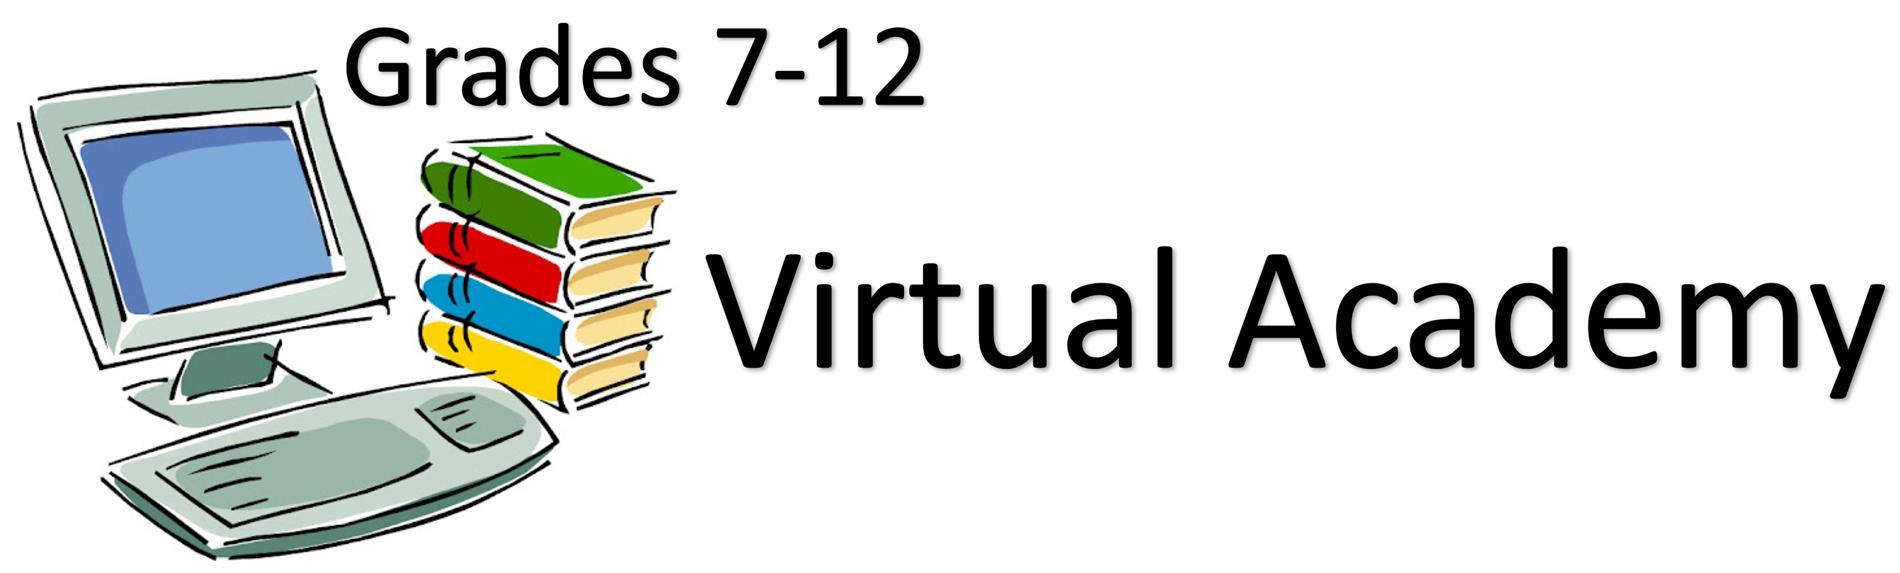 VA 7-12